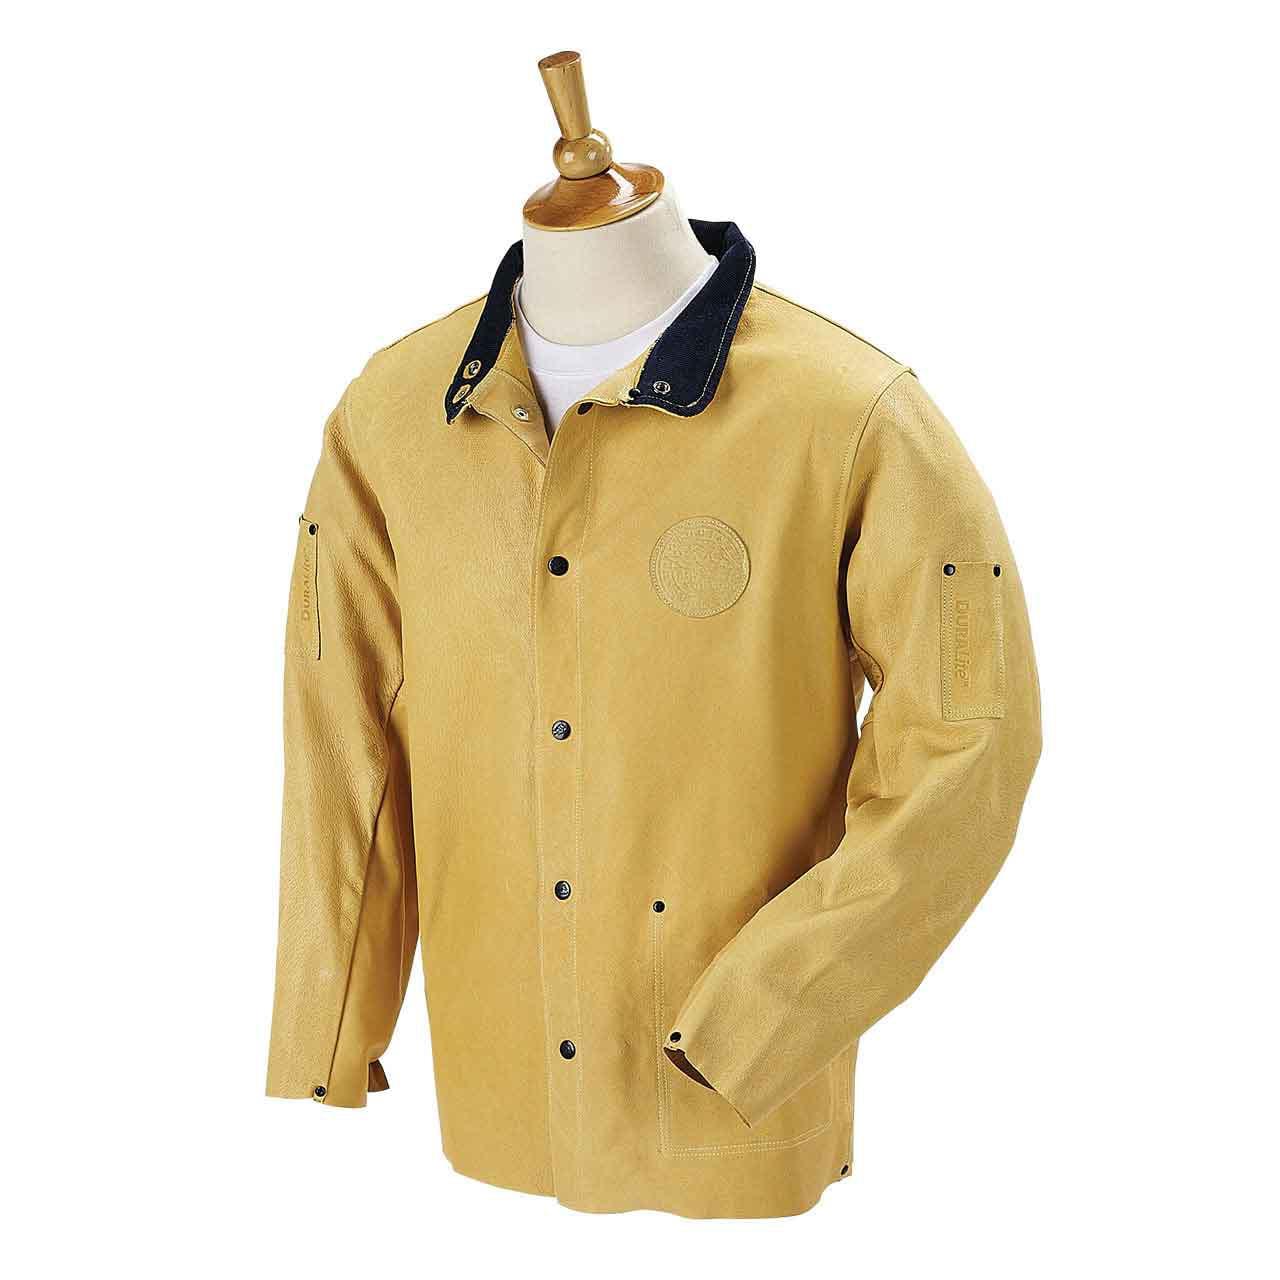 "DuraLite Premium Grain Pigskin Welding Coat - 30"", Size Large"